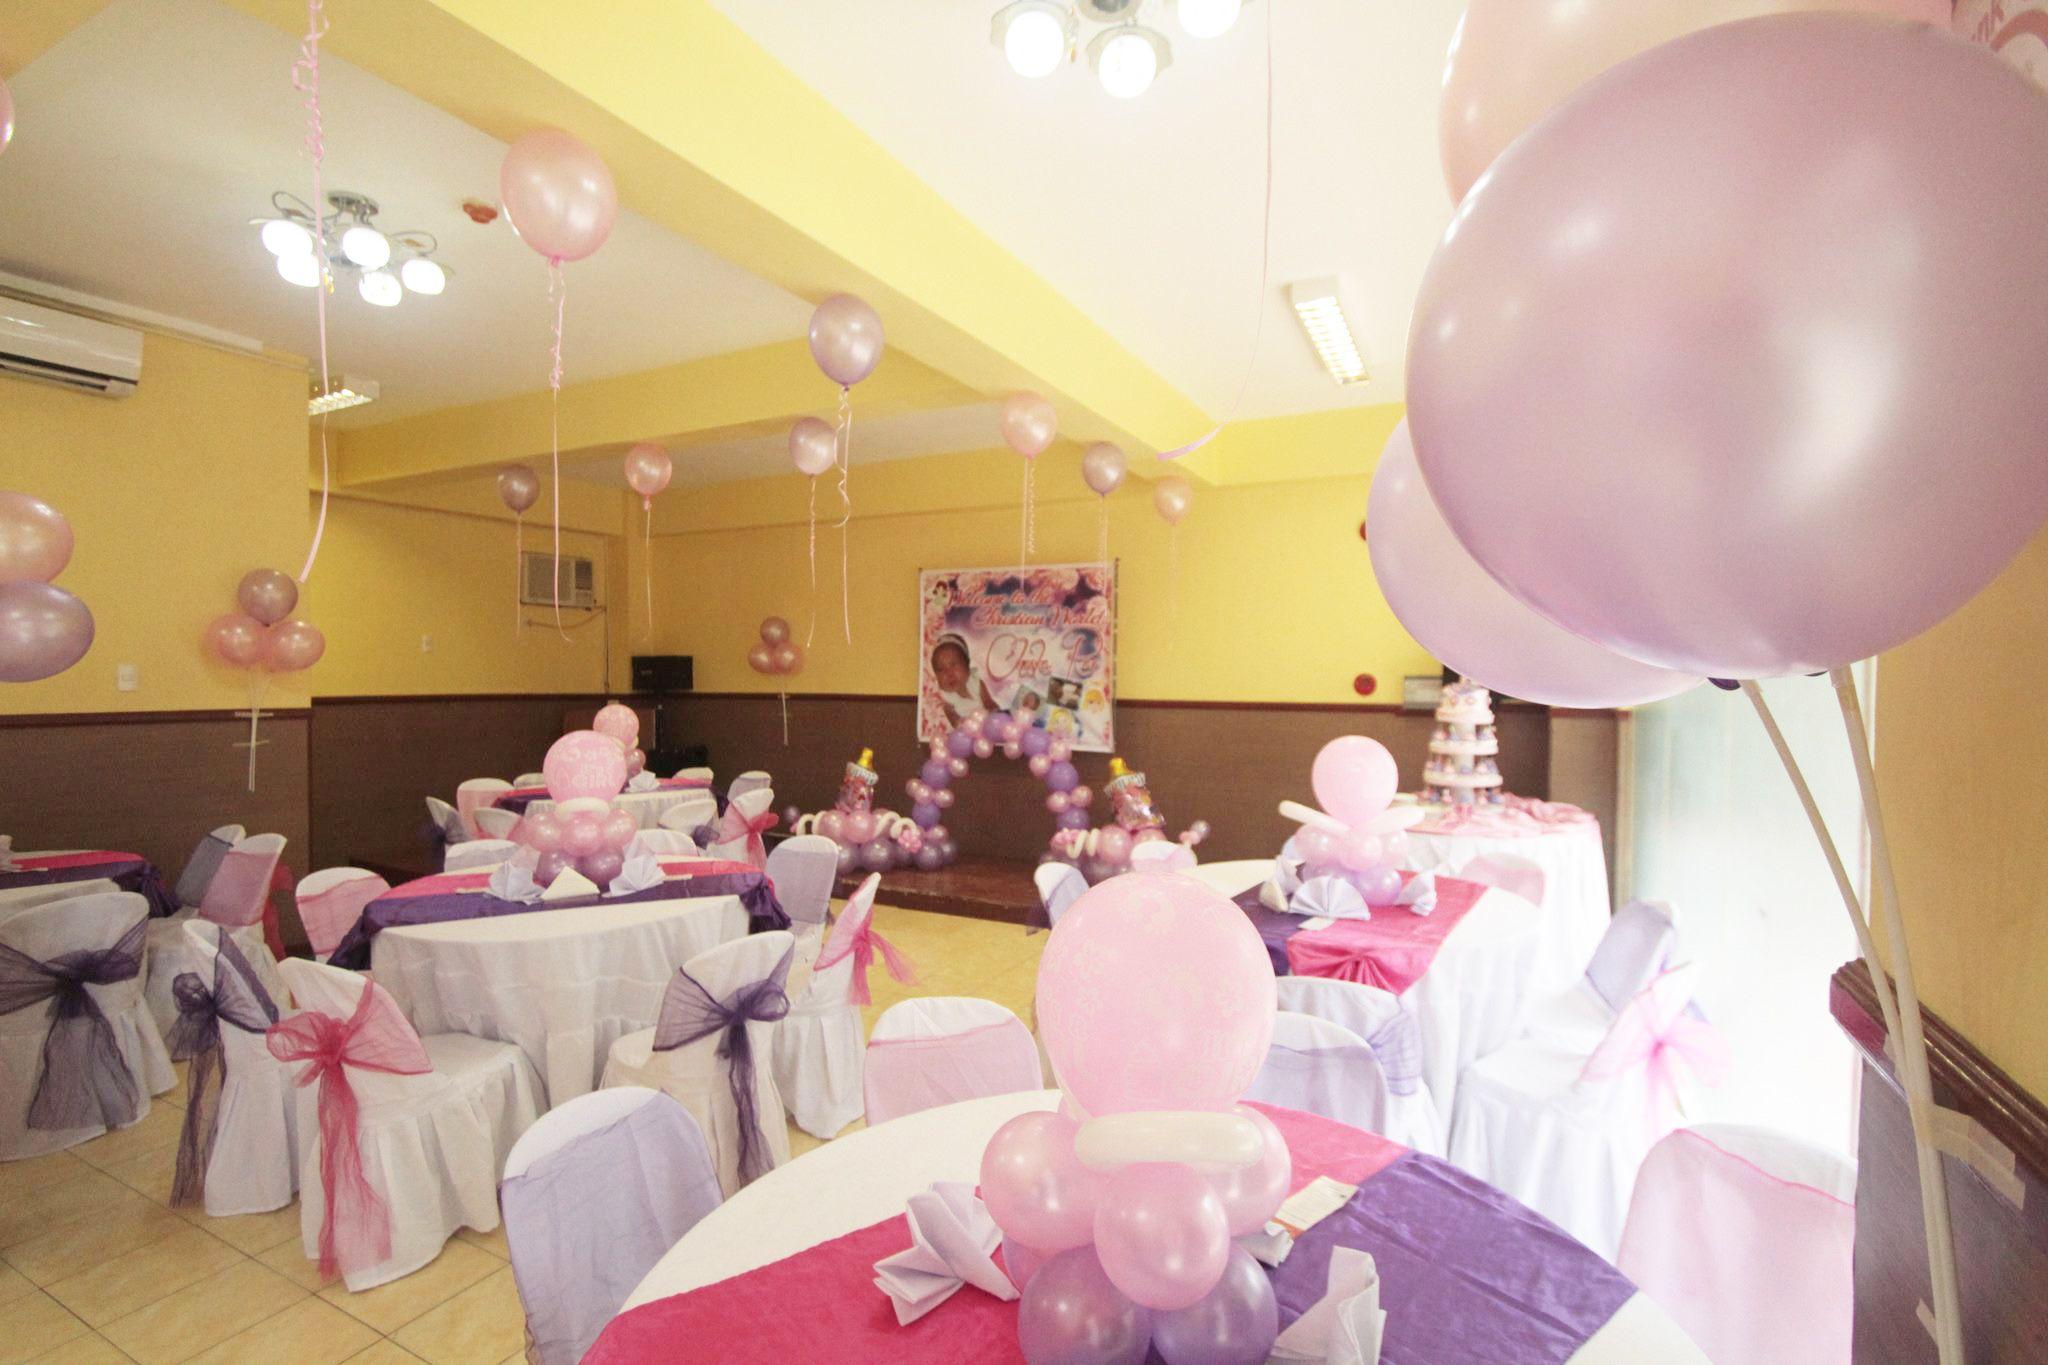 Christening celebration ideas hannah 39 s party place for Balloon decoration for christening party